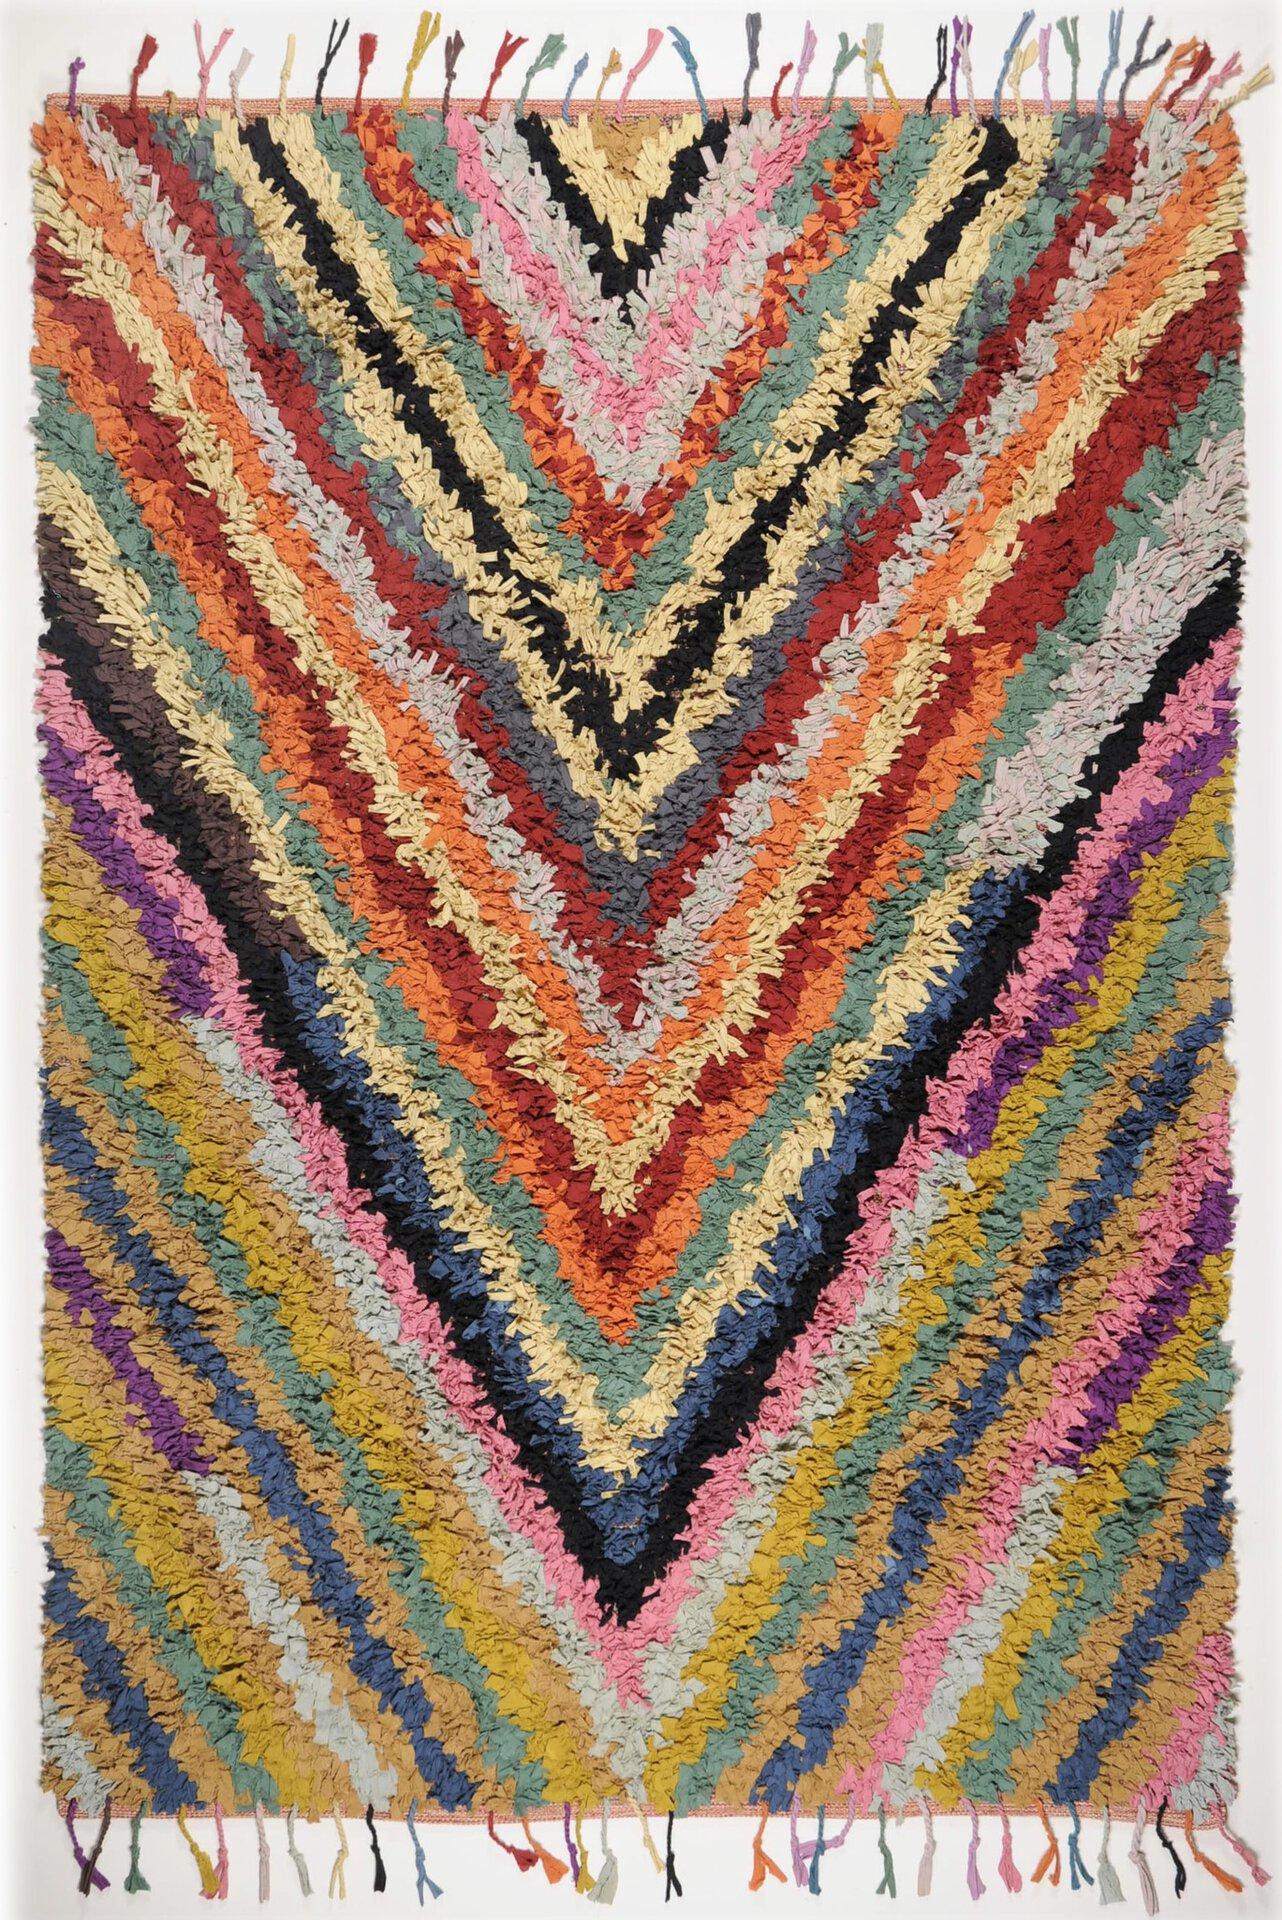 Handwebteppich Woven Rug Theko Textil mehrfarbig 1 x 2 cm